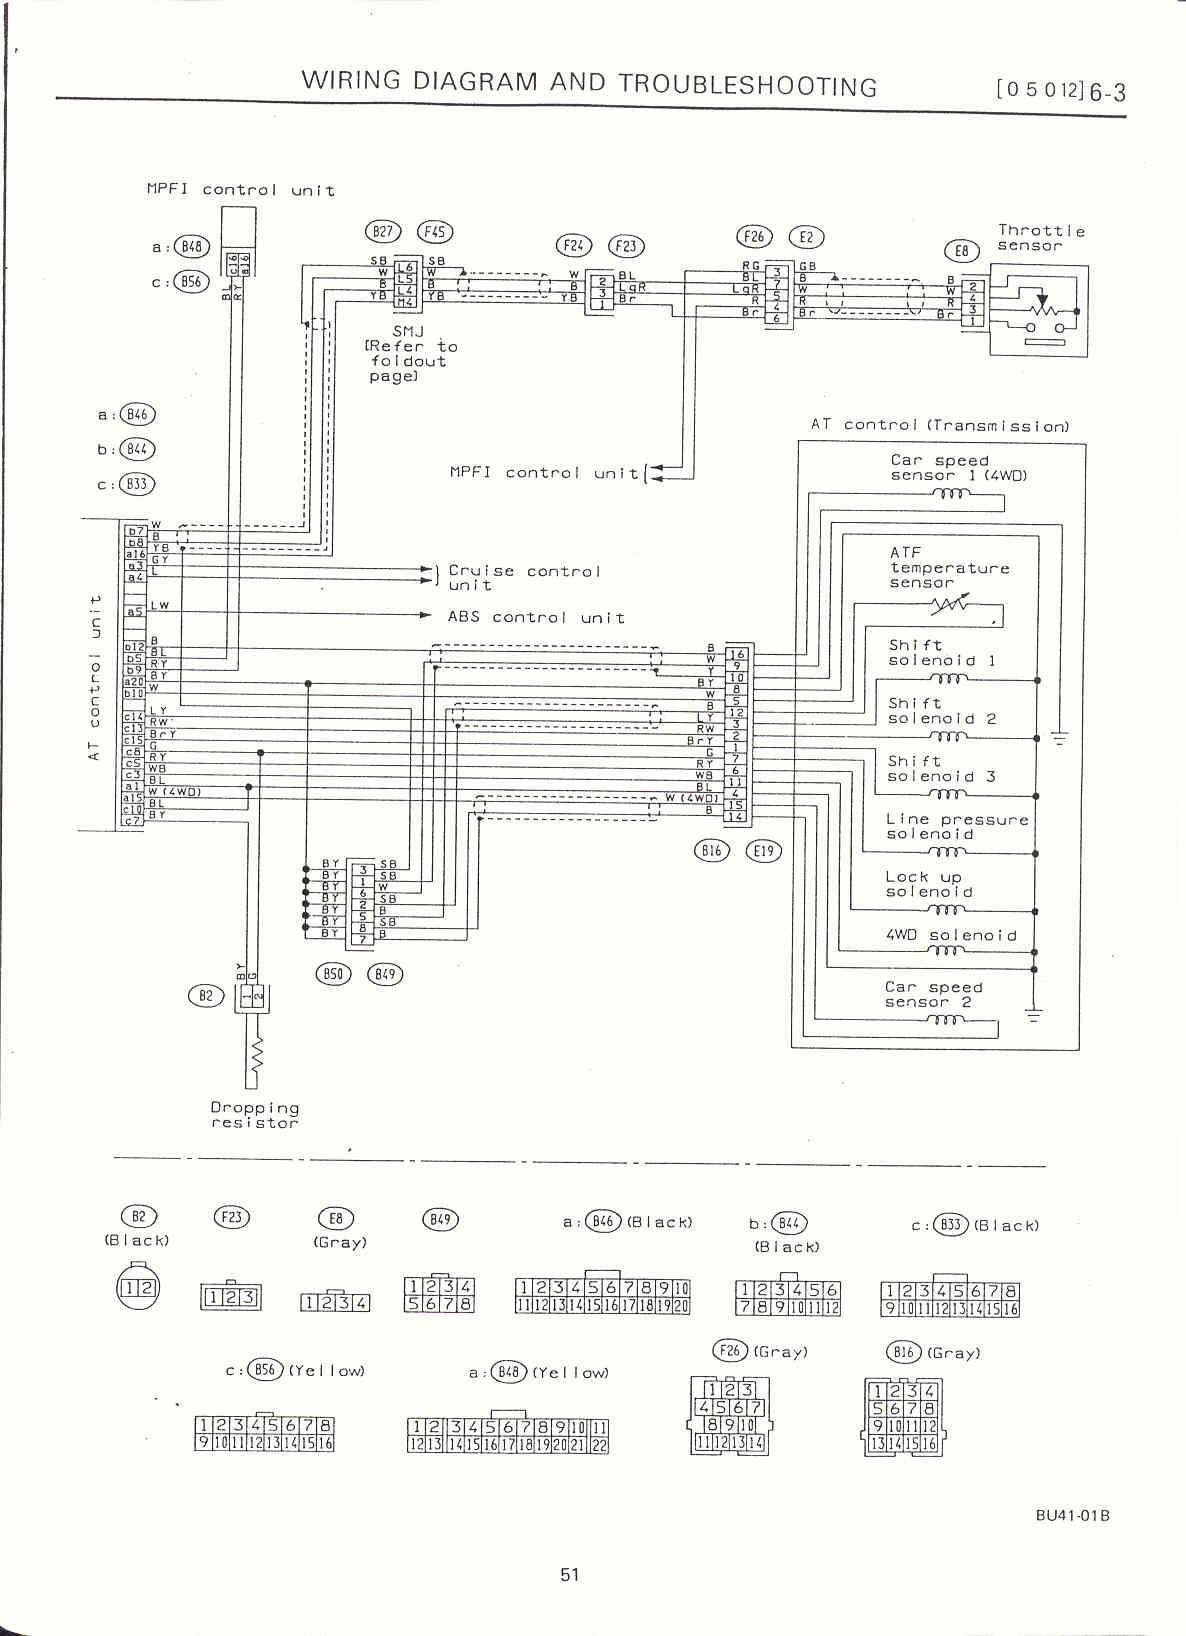 hight resolution of 2005 subaru forester engine diagram wiring library 2014 subaru forester 2 5xt subaru engine diagram